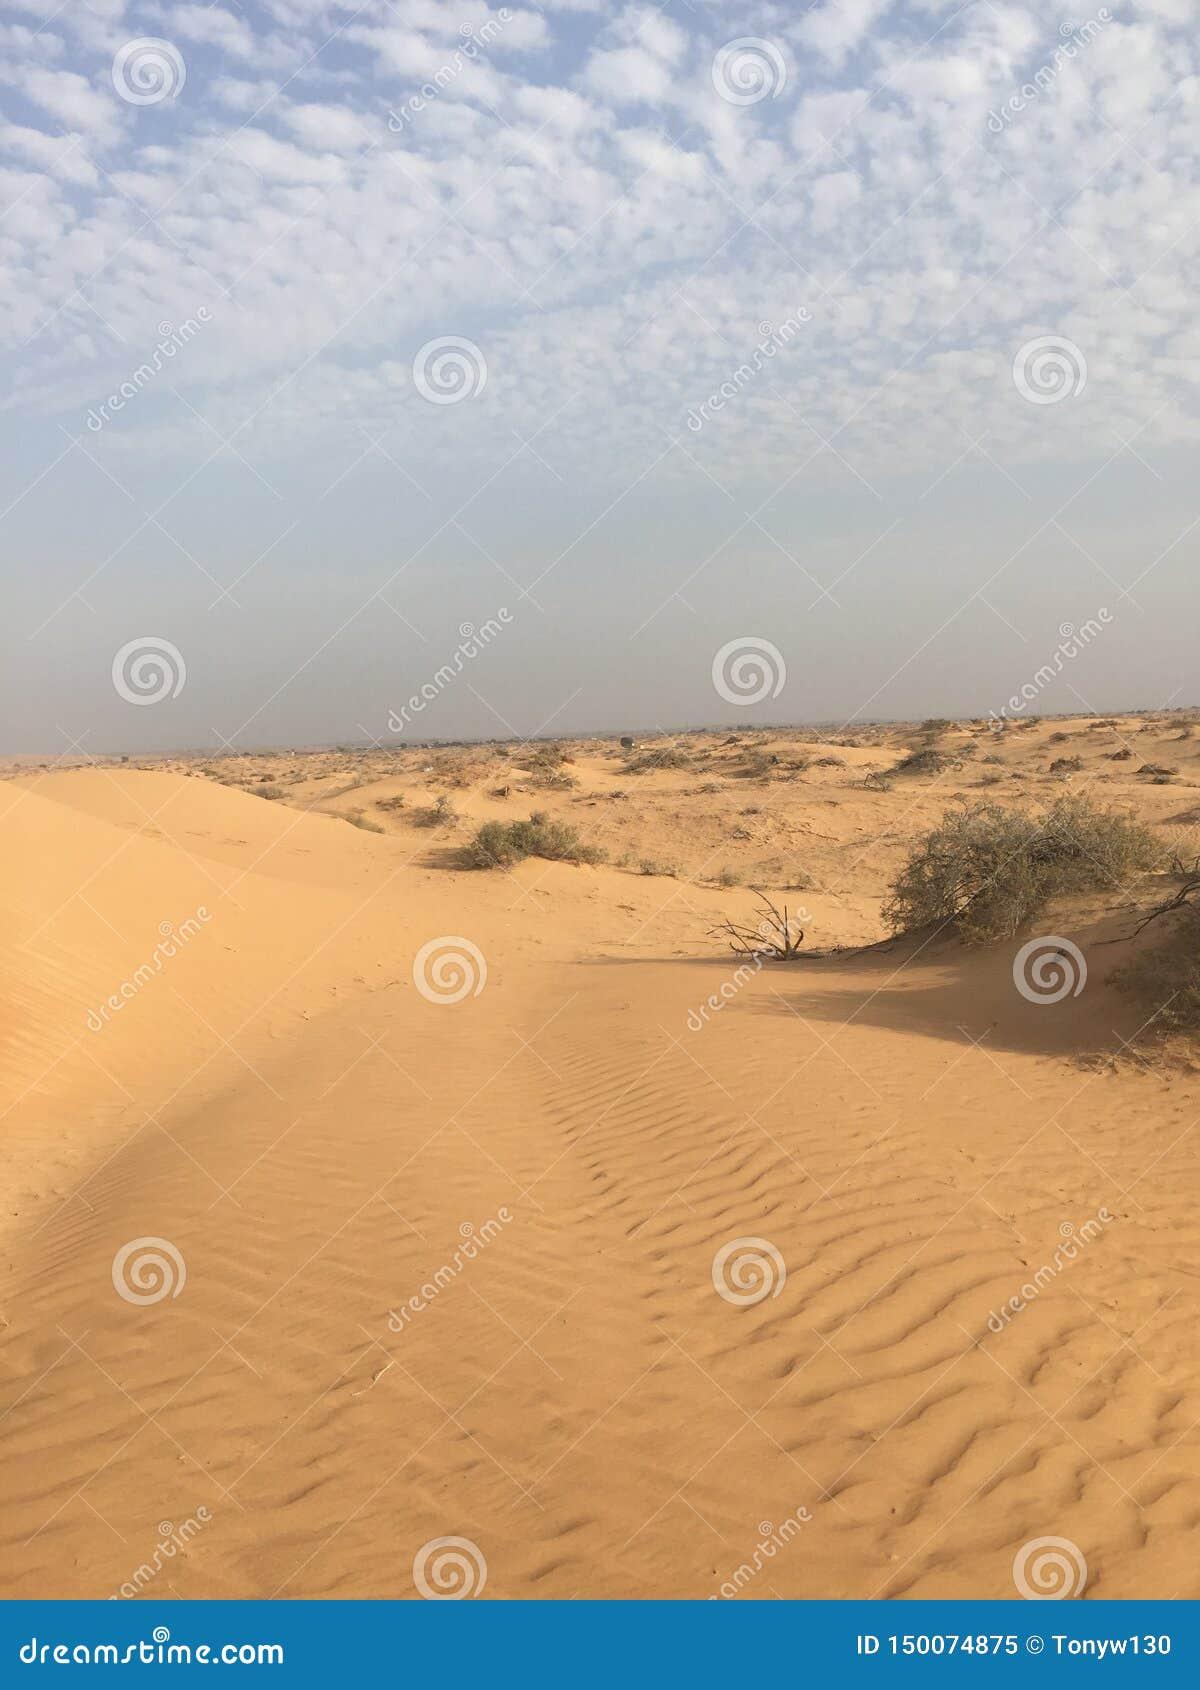 Had a look at desert